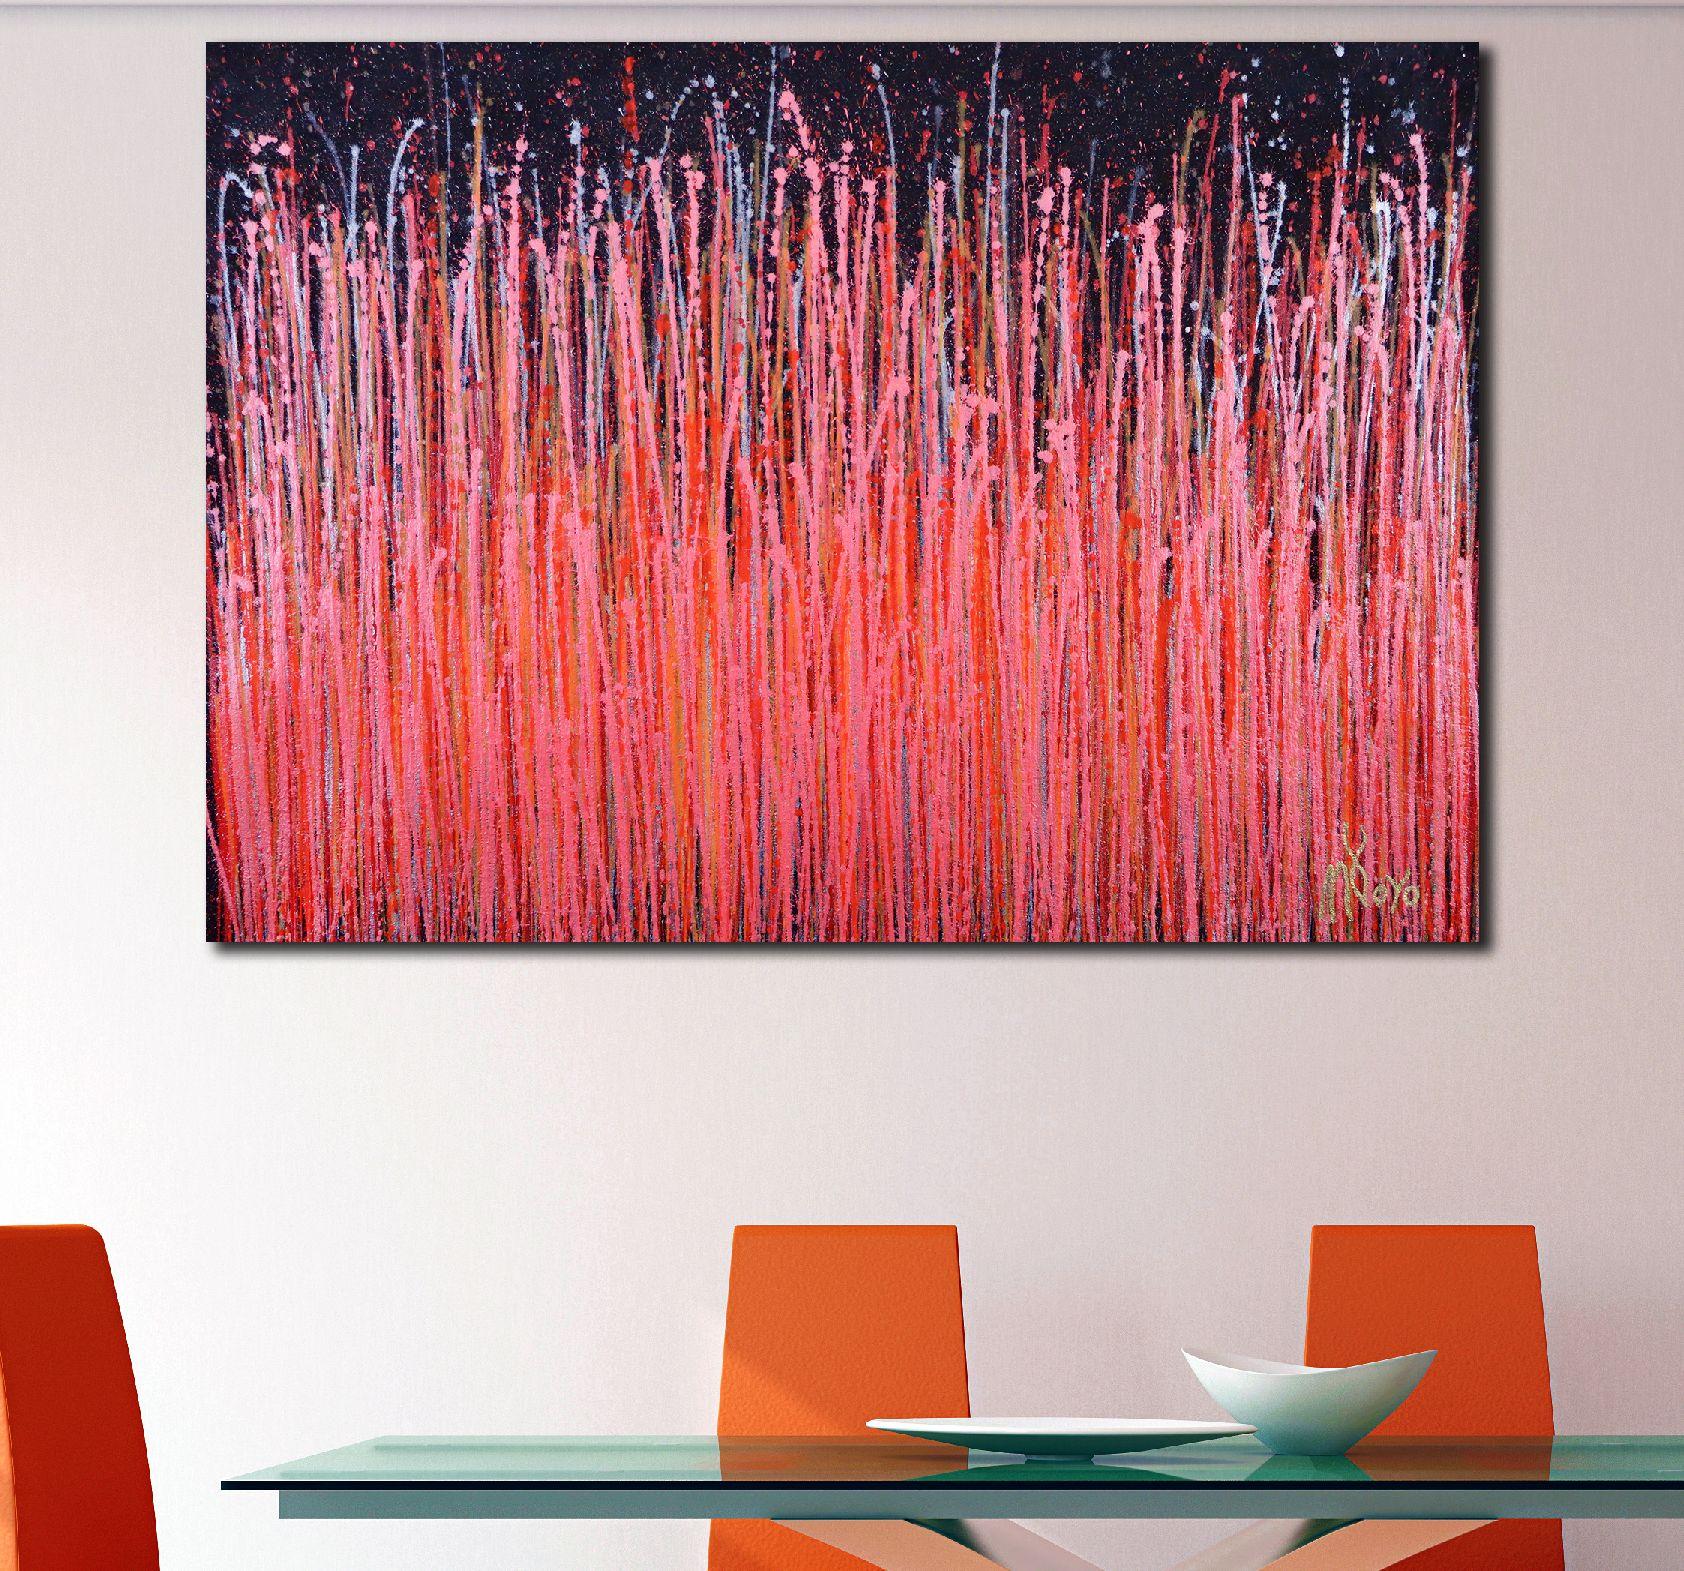 SOLD - Room View - Carmin Spectra ( Florescent Garden) (2020) by Nestor Toro